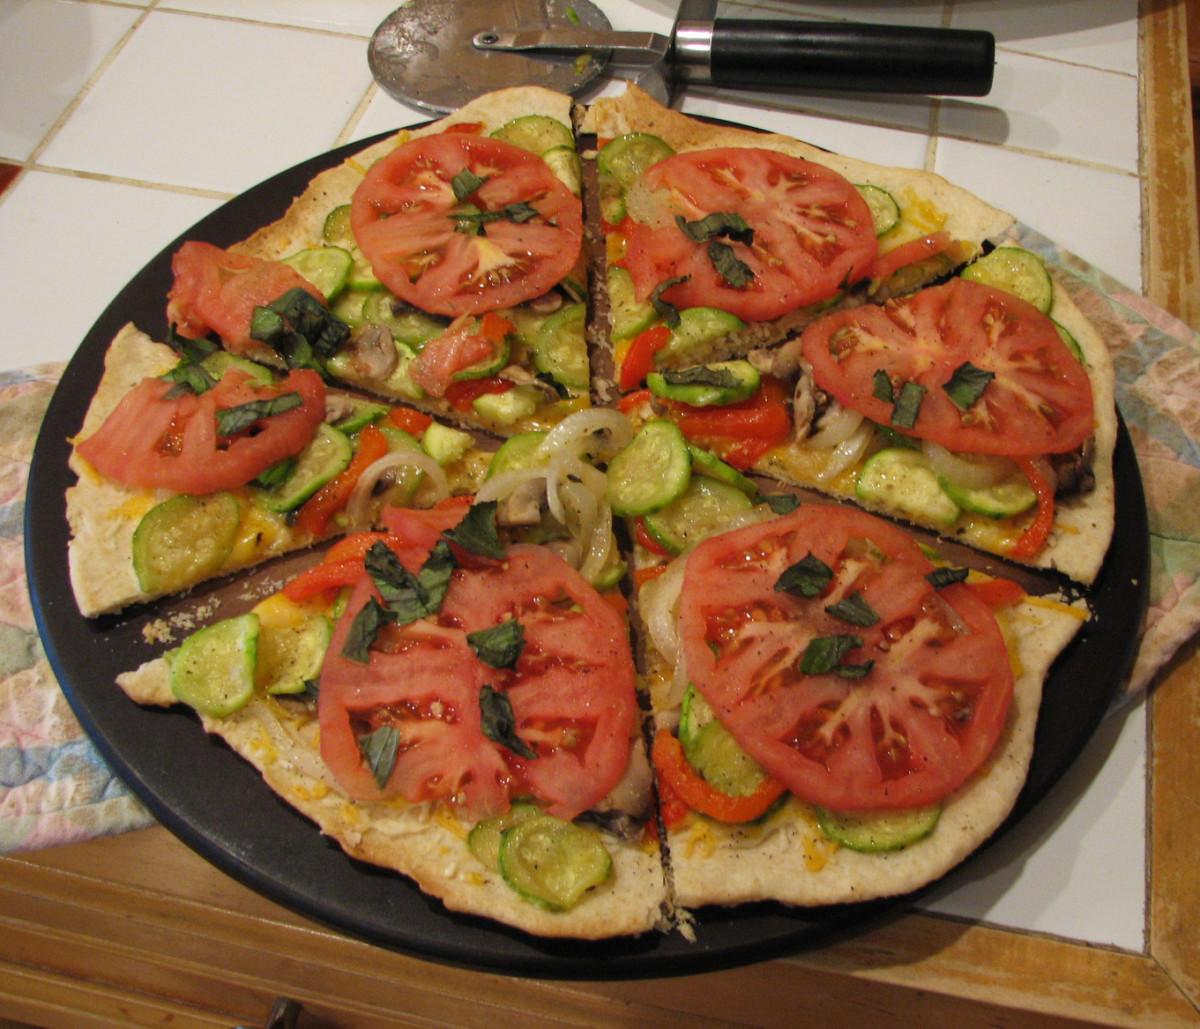 Wonderfully Scrumptious Flatbread Recipe (Plus Topping Ideas)